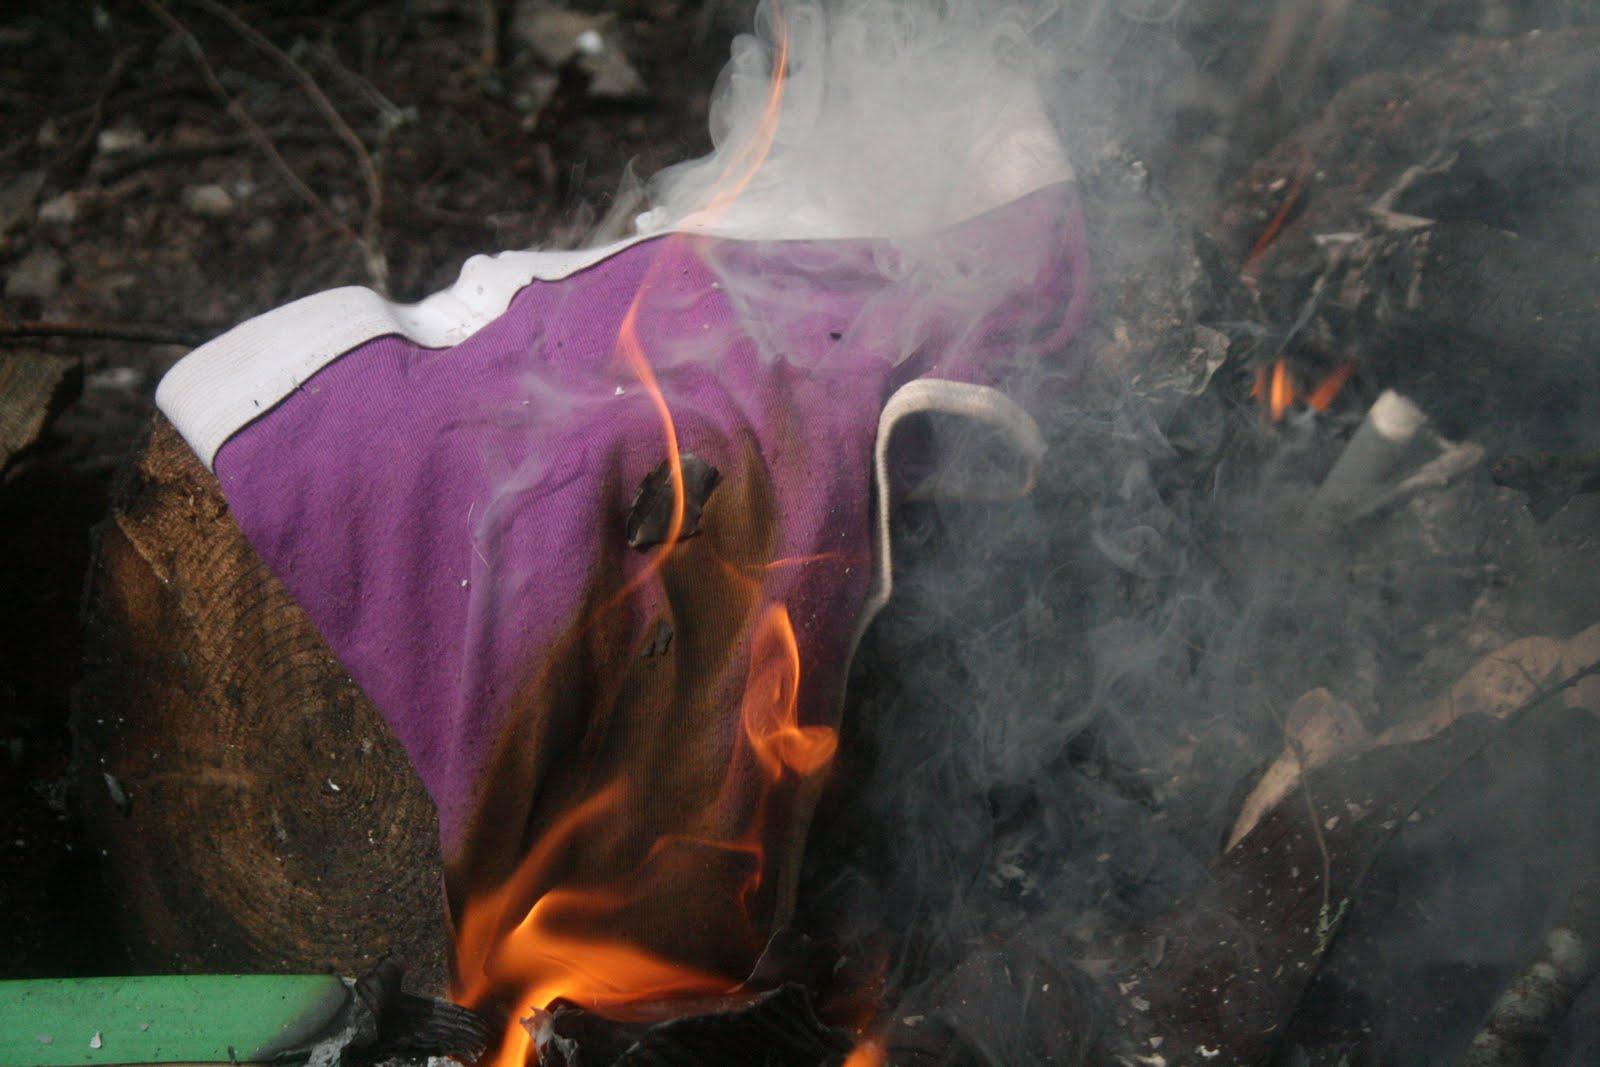 Brutal bra burning